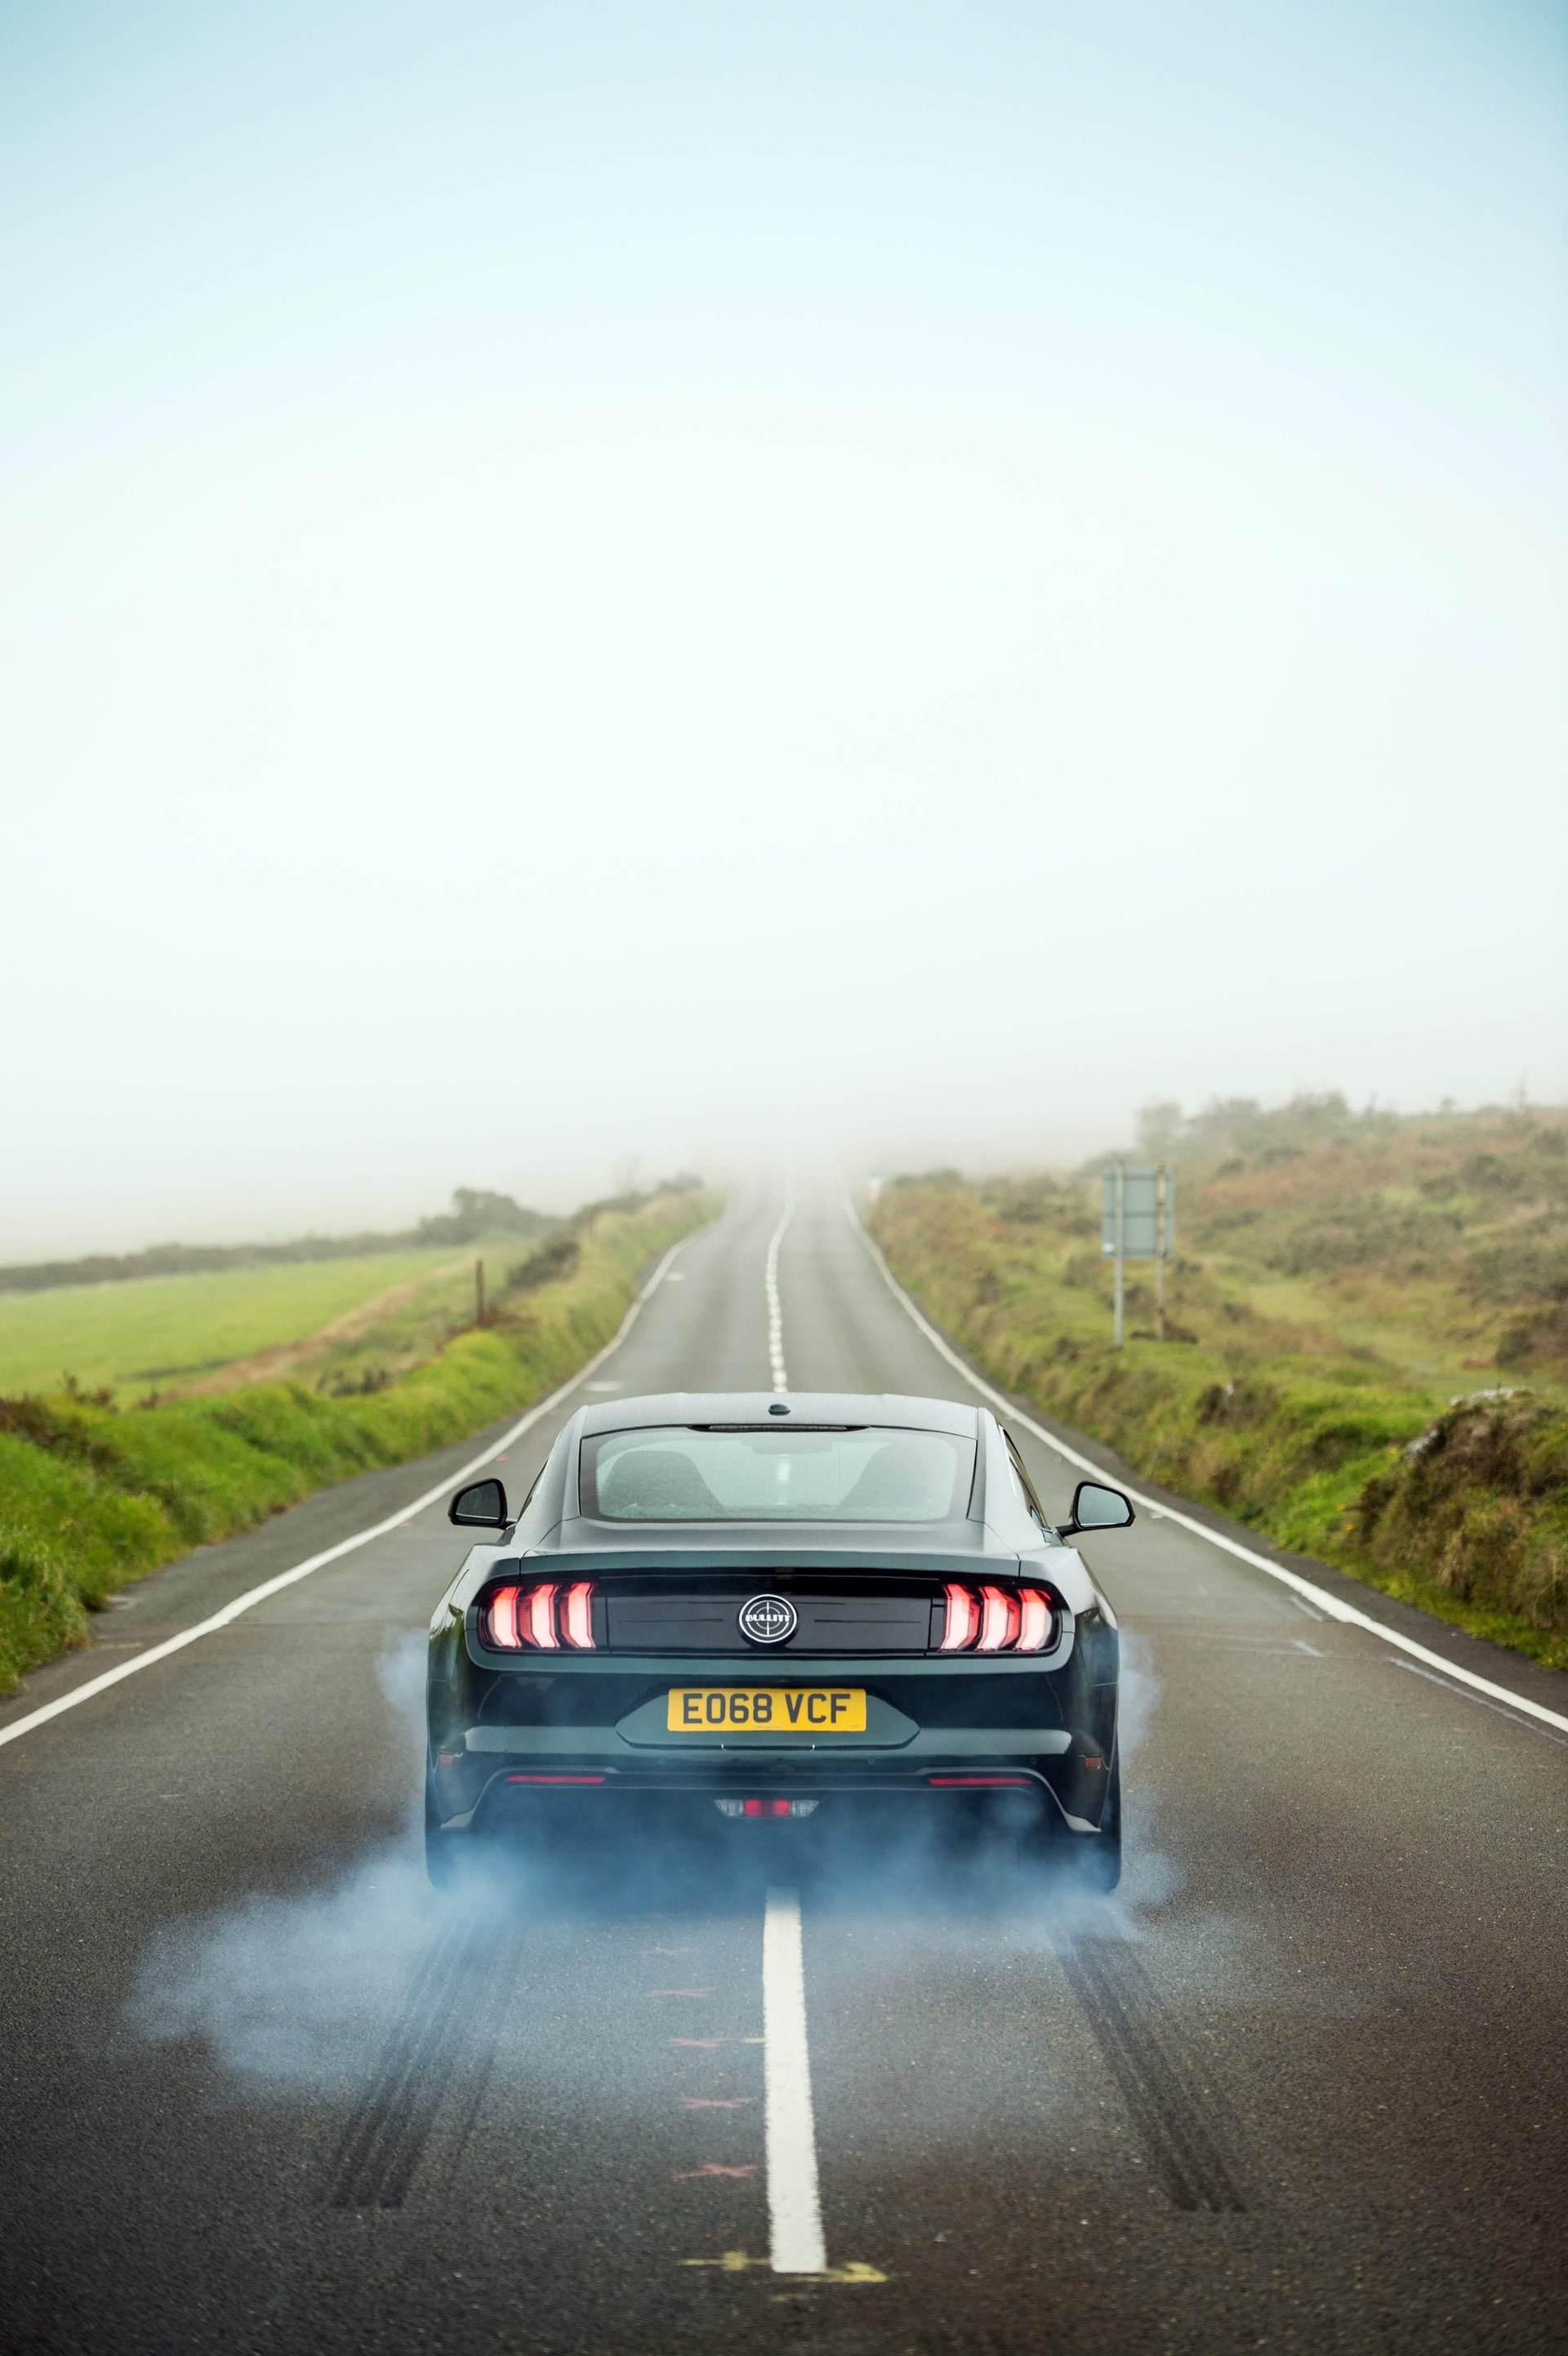 2019_Ford_Mustang_Bullitt_Isle_of_Mman0009